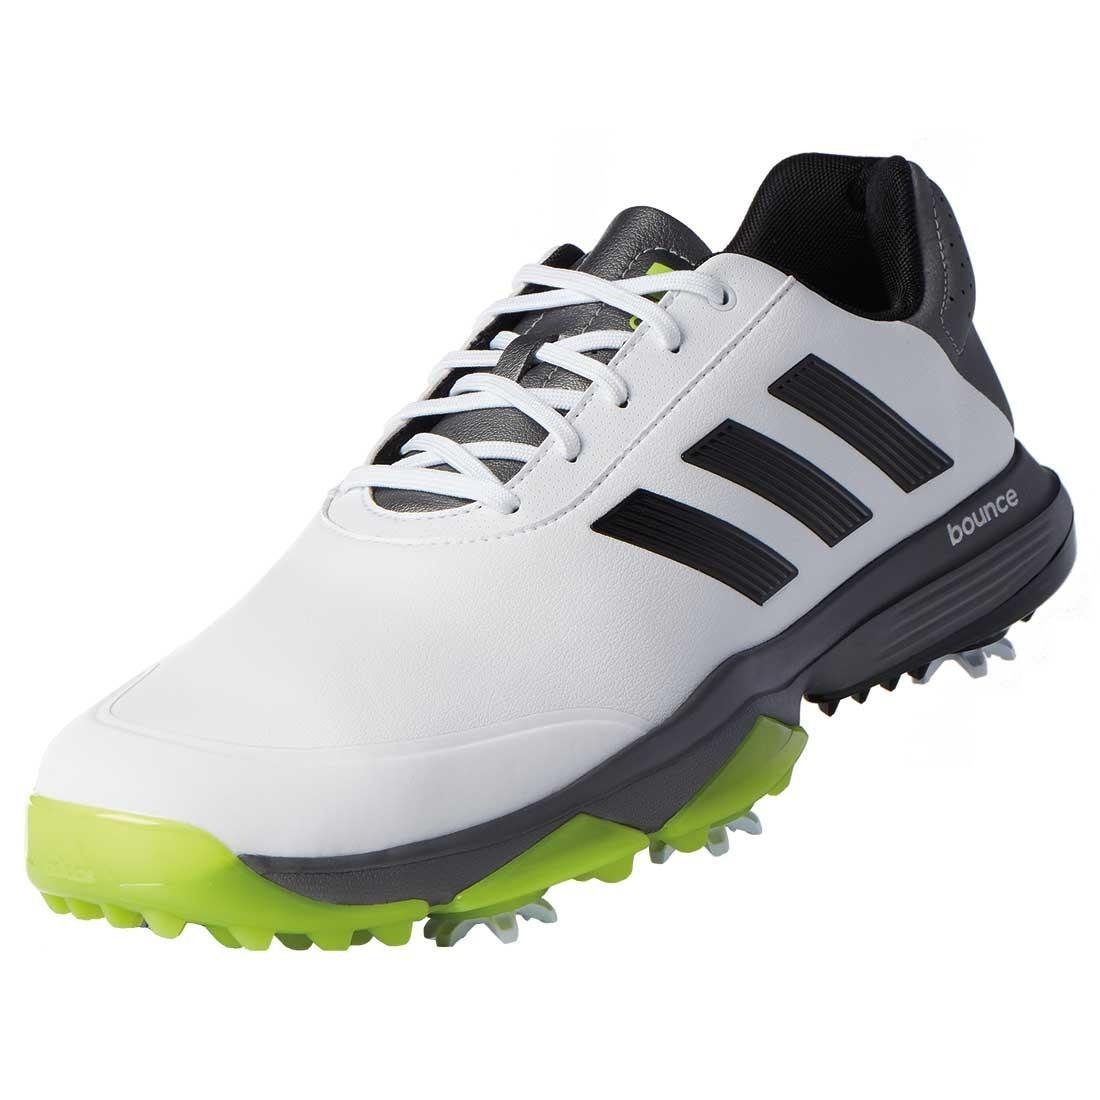 e91955d1fe2 Sapato adidas Adipower Bounce Branco preto - 8 (usa) - R  620